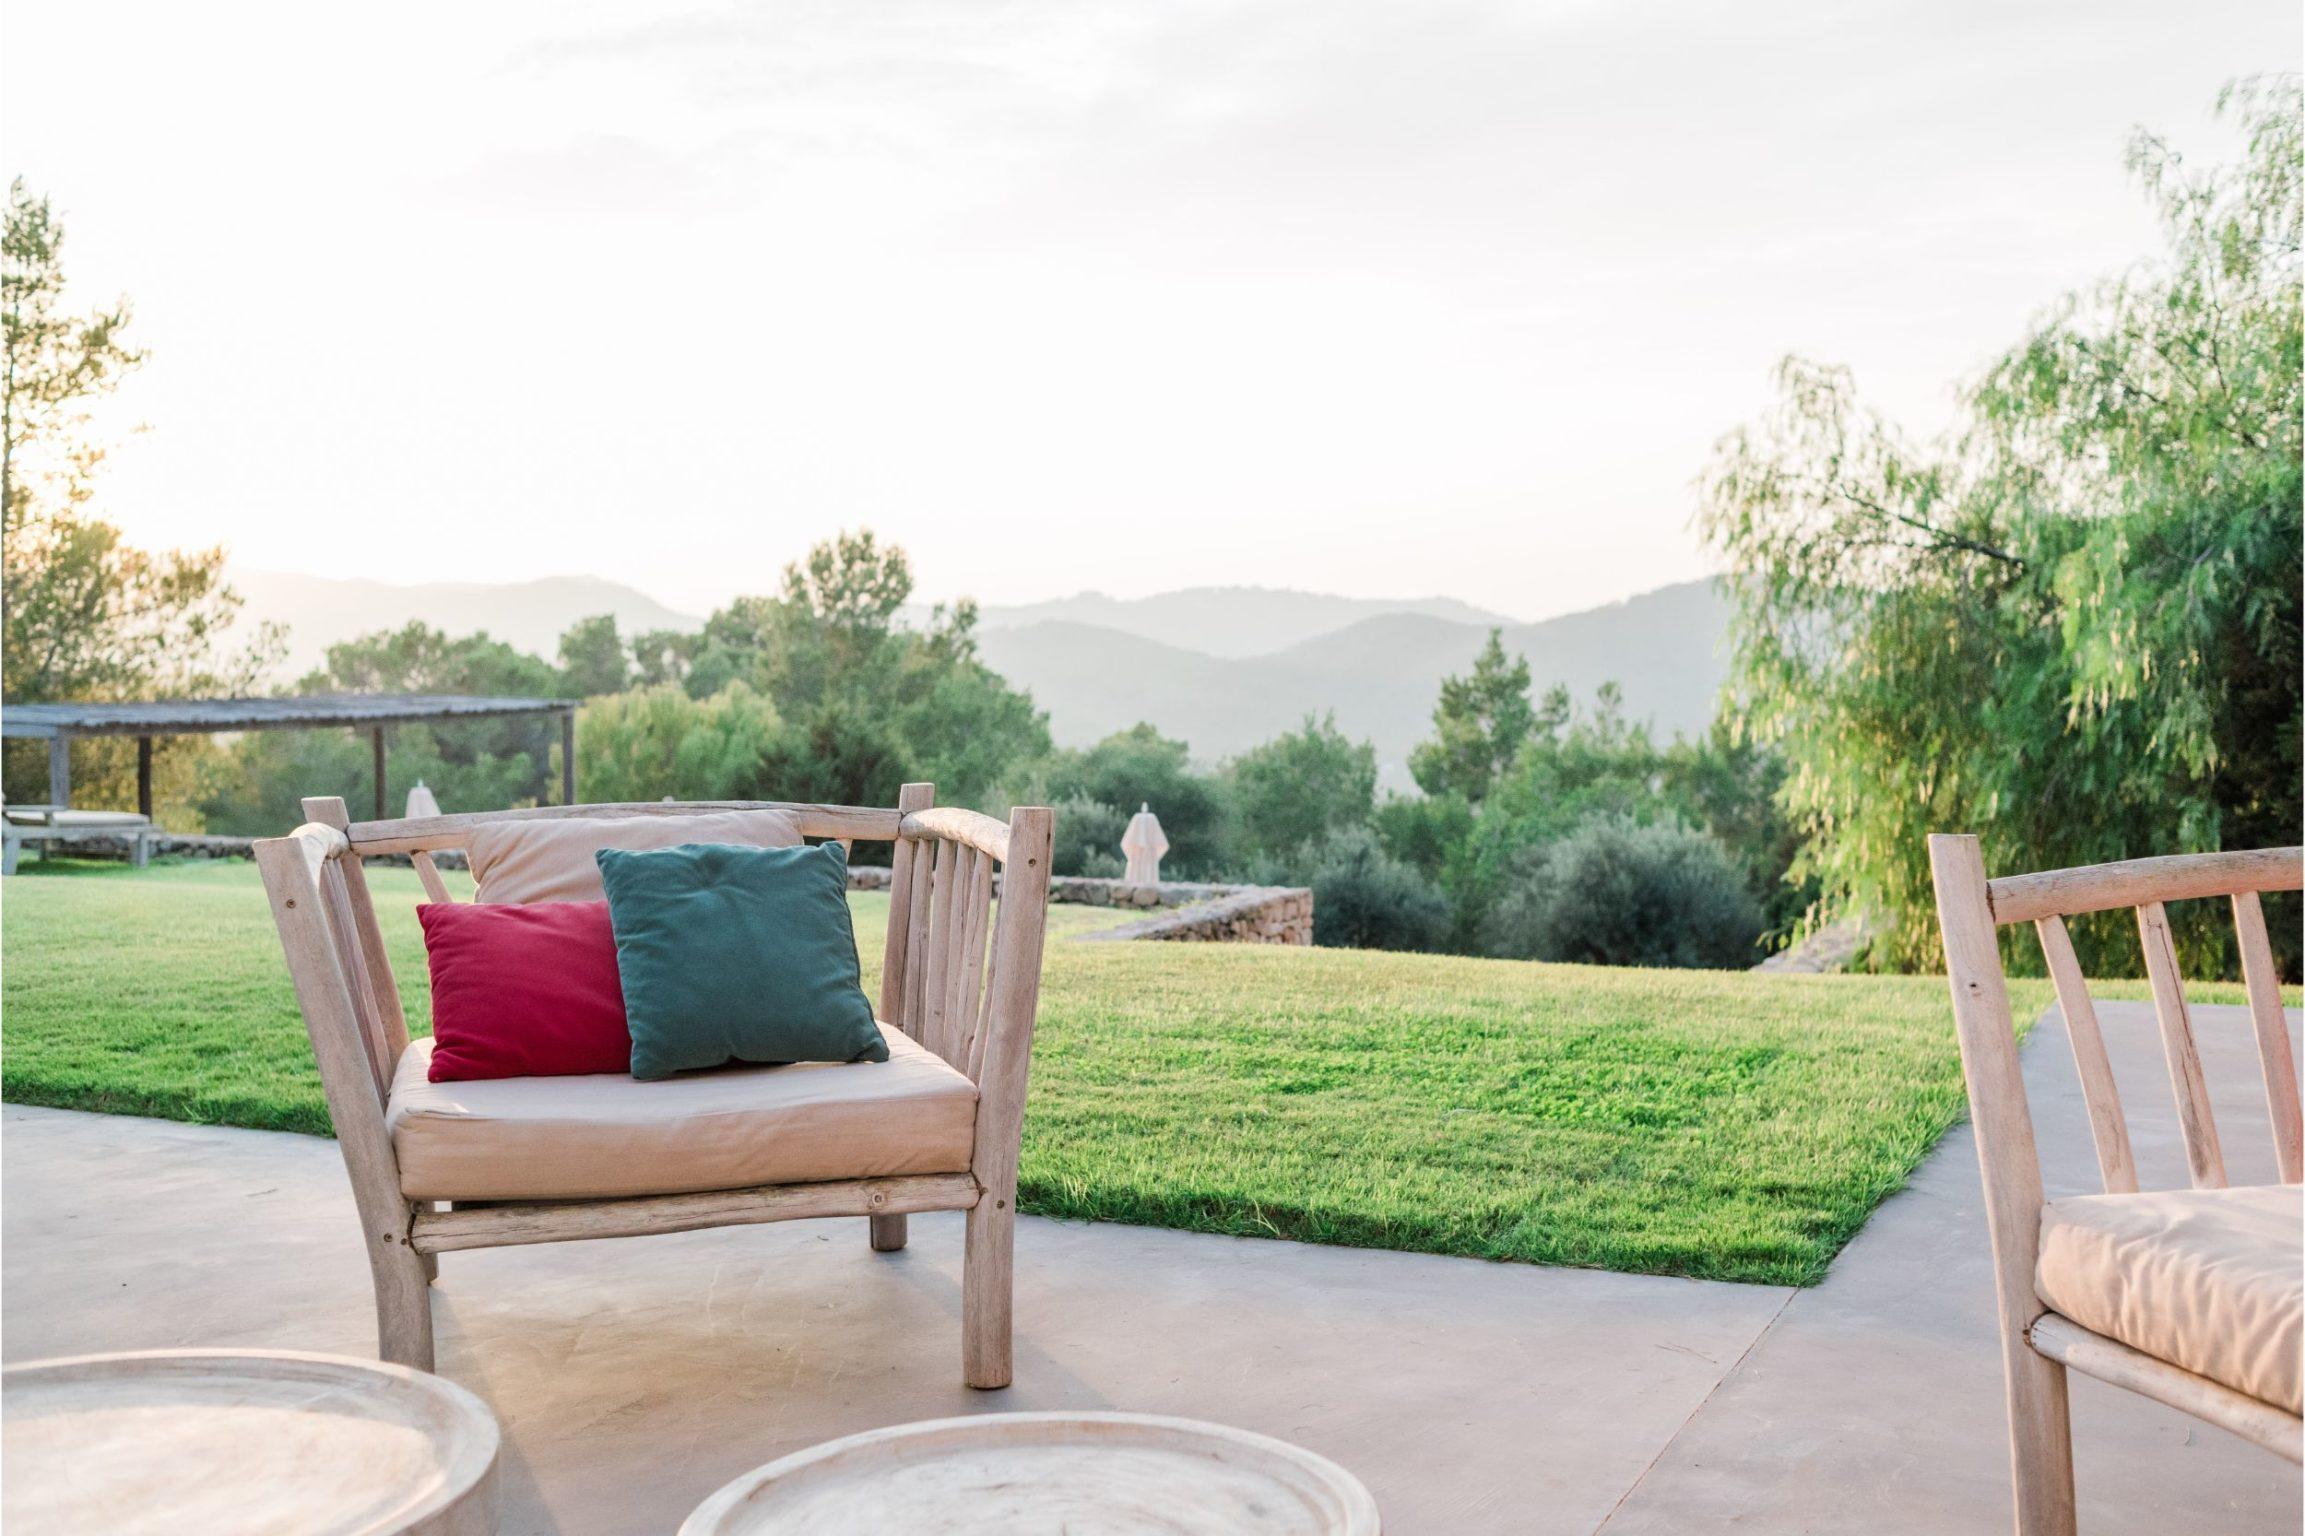 https://www.white-ibiza.com/wp-content/uploads/2020/02/white-ibiza-villas-can-zama-outdoors-2-2305x1536.jpg